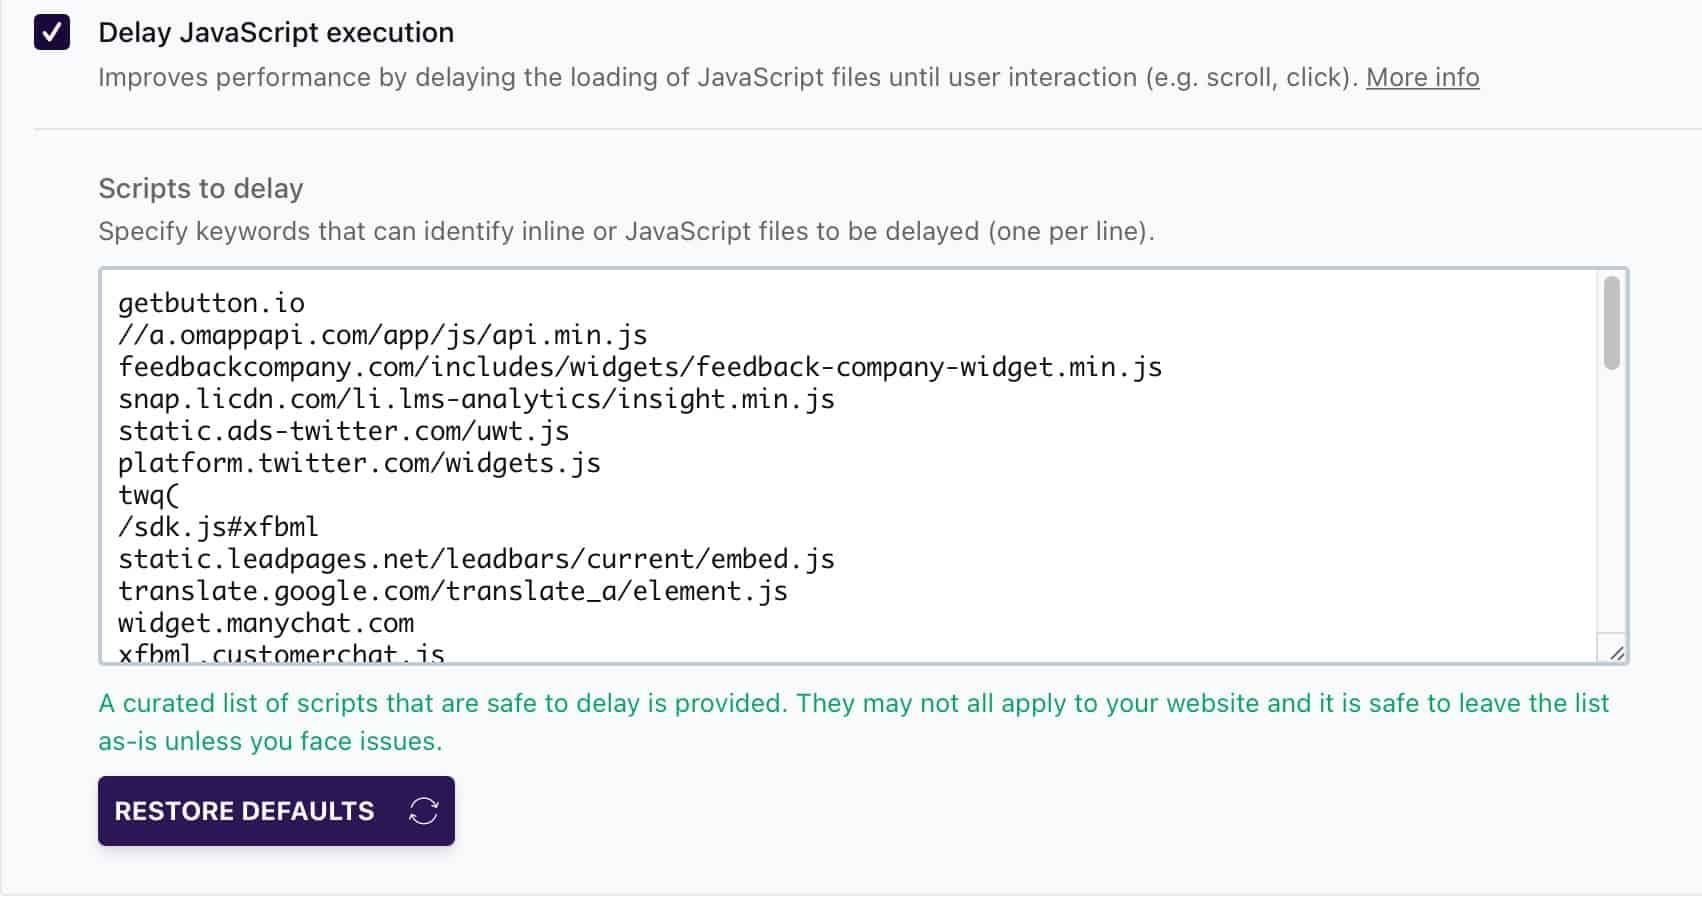 WP Rocket Delay Javascript